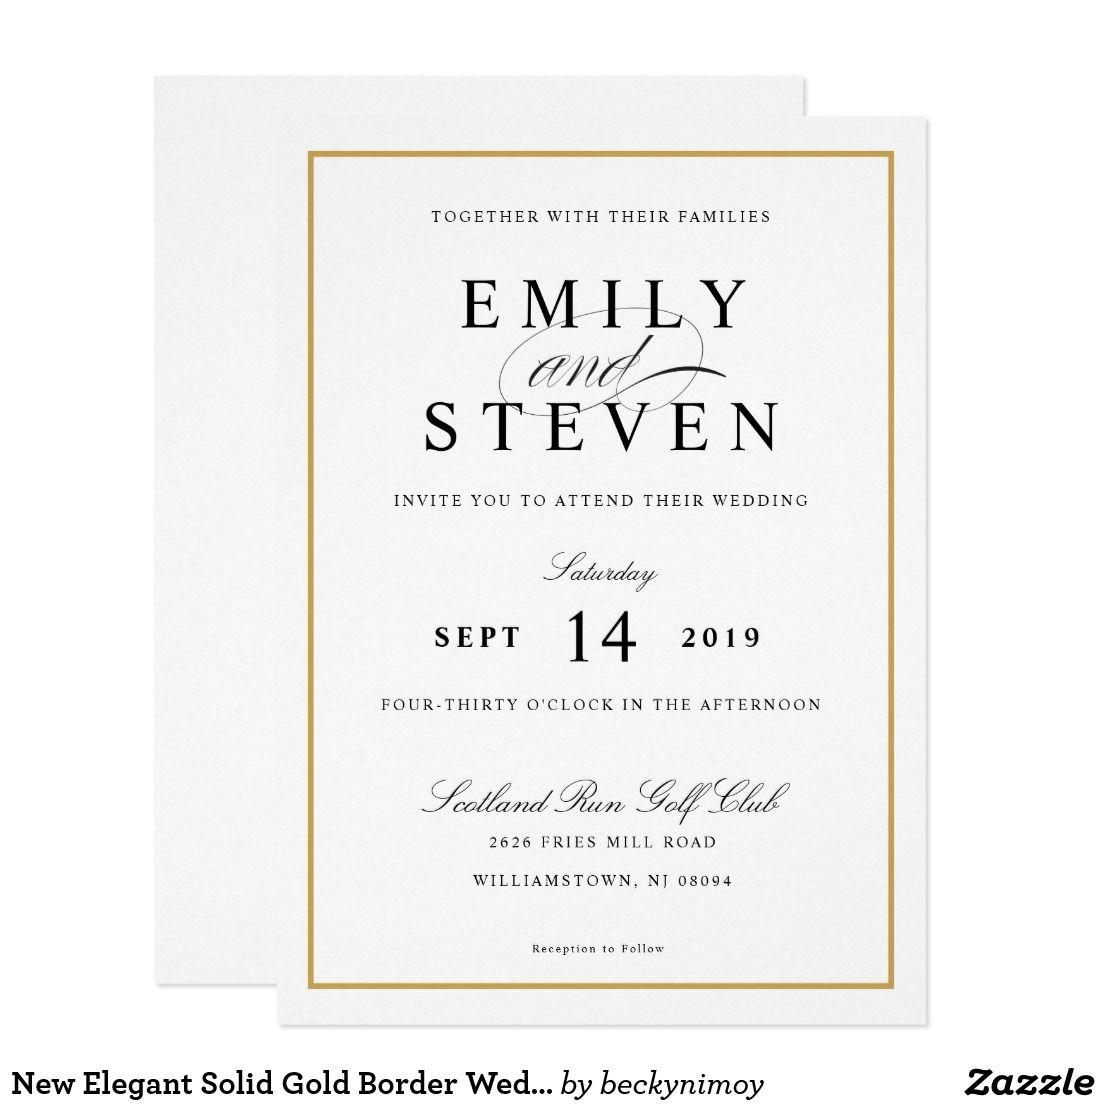 New Elegant Solid Gold Border Wedding Card